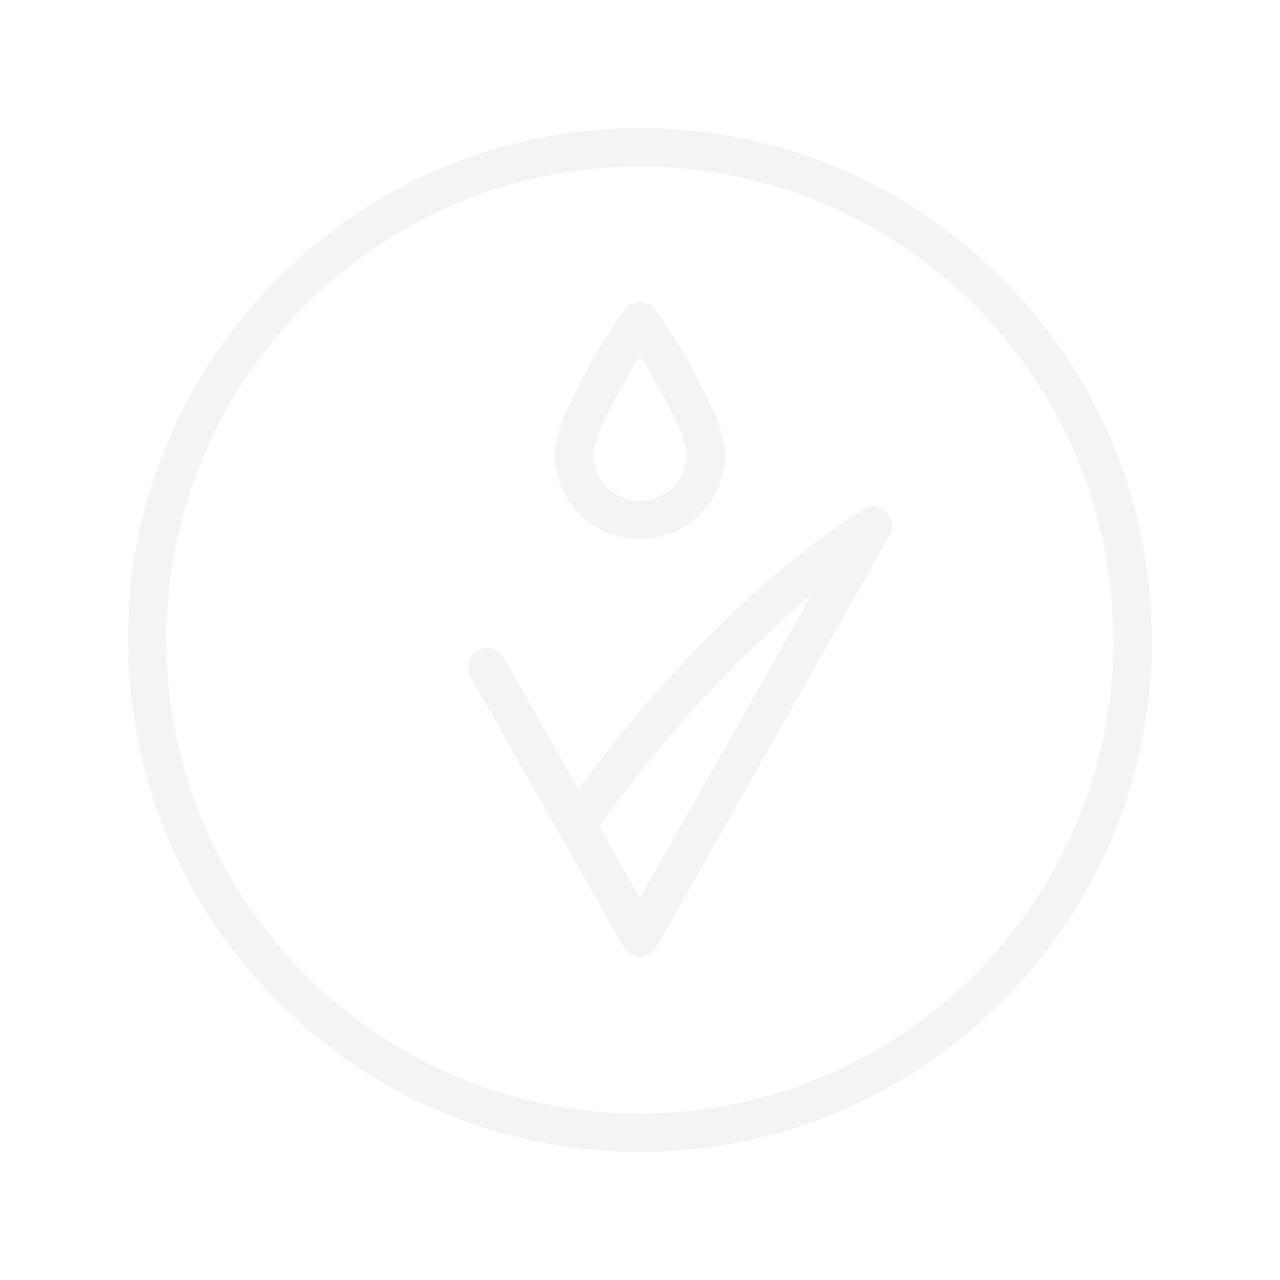 GLO SKIN BEAUTY Shimmer Brick 7.4g